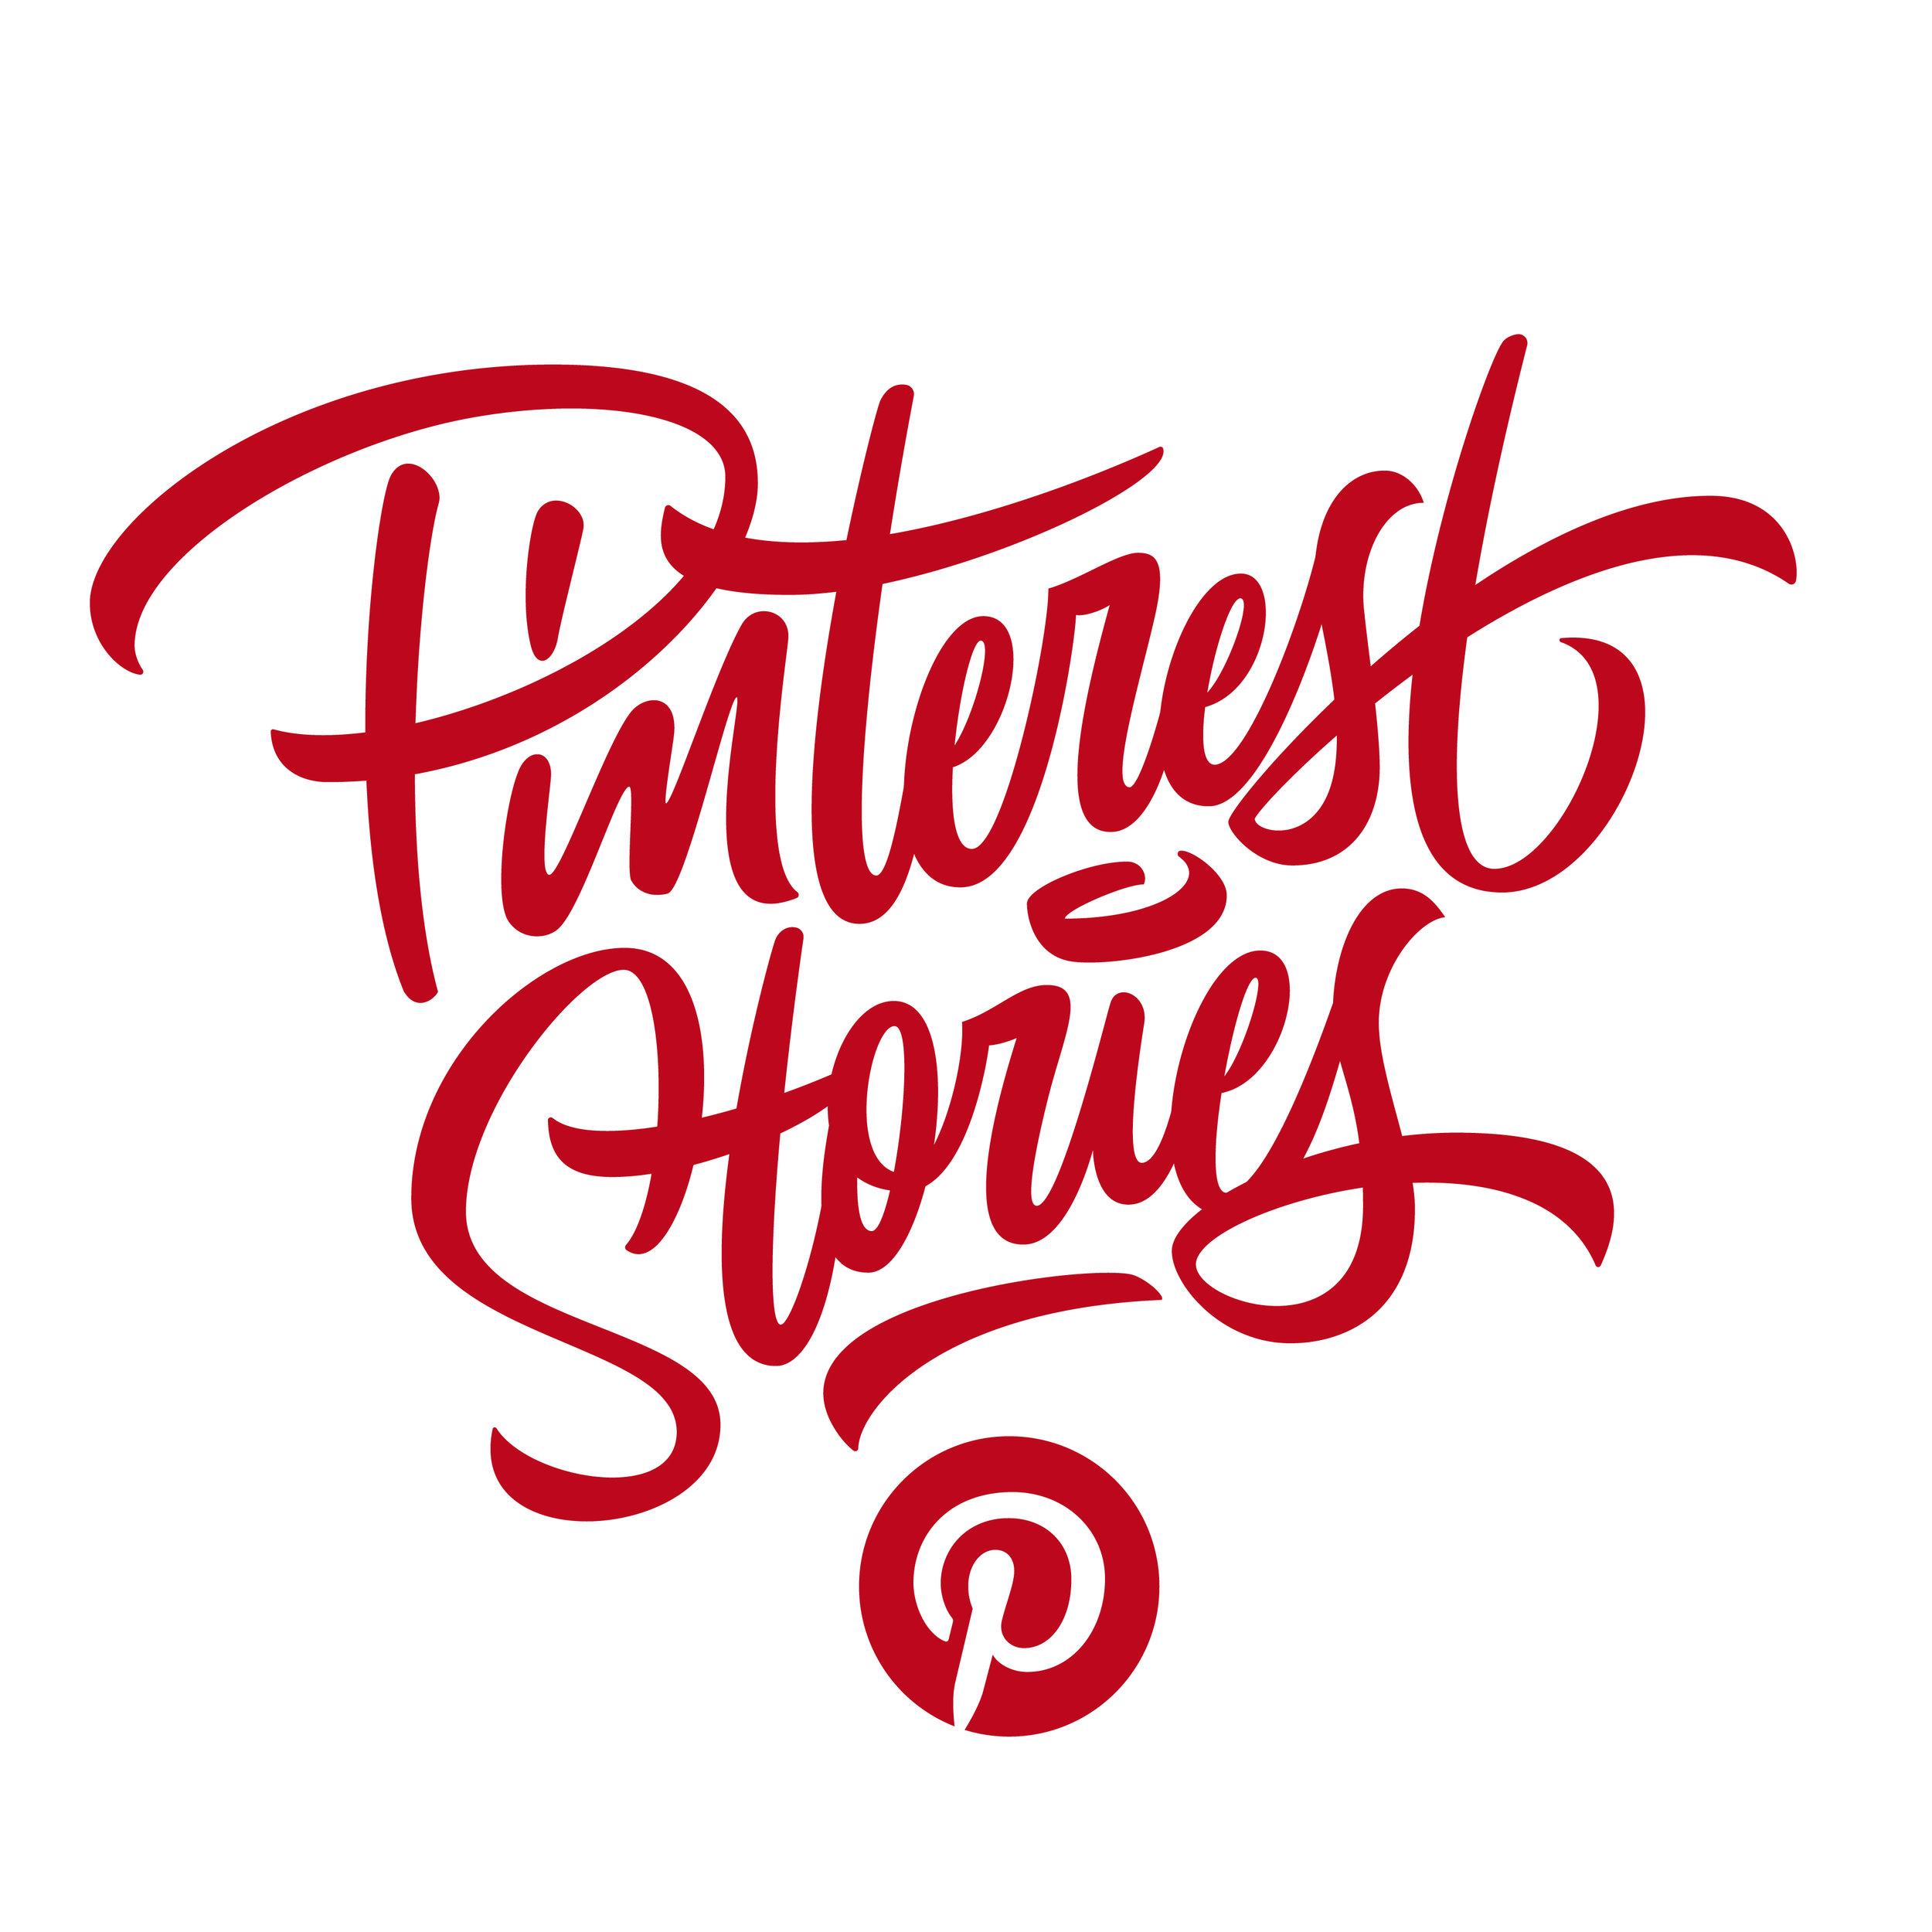 Jeremy-Friend-Pinterest-Stories.jpg